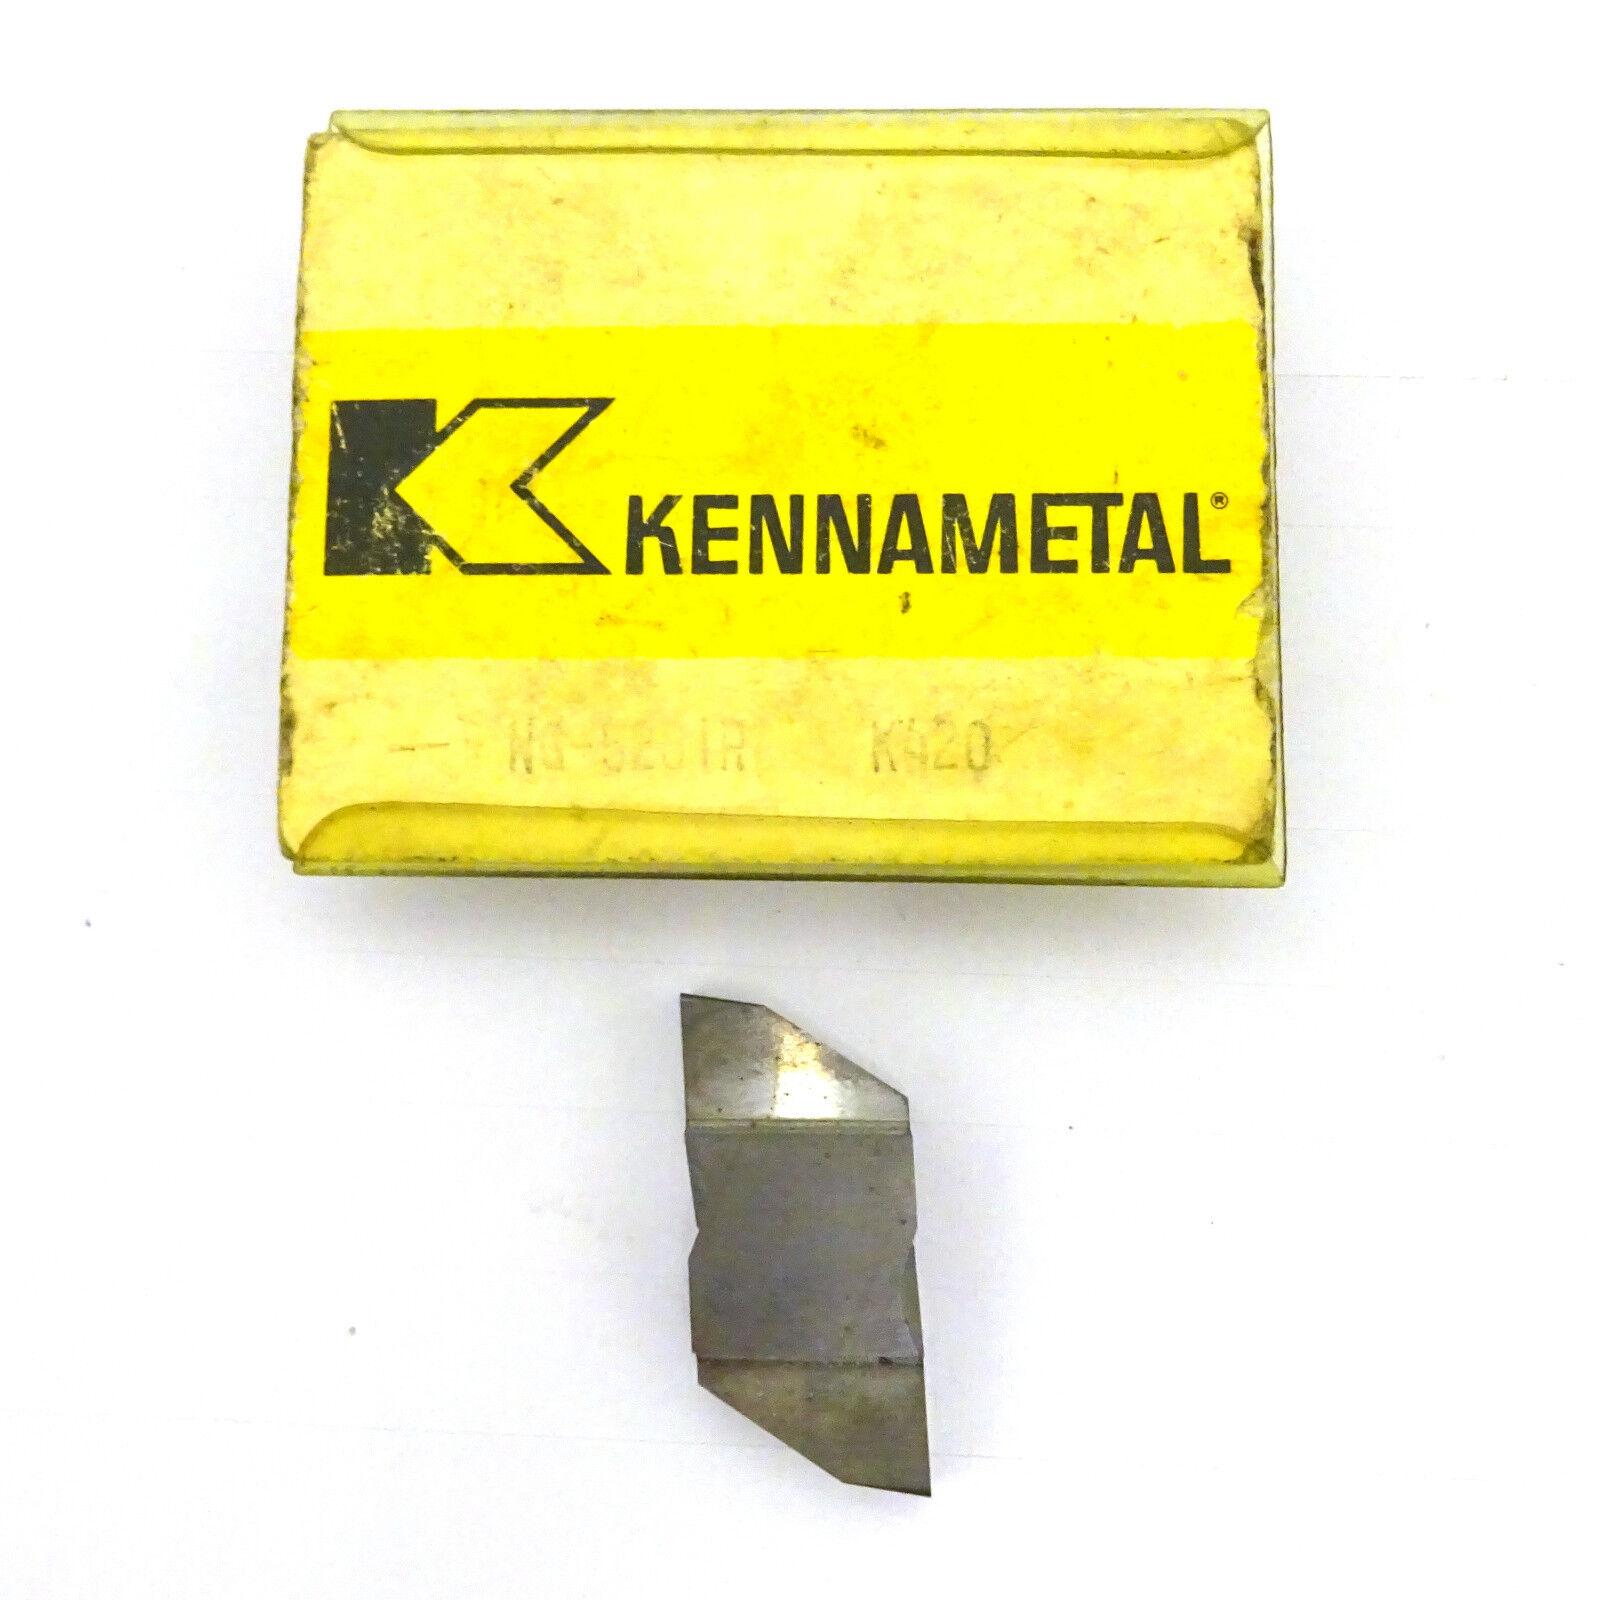 8 Kennametal Carbide Grooving Inserts B171428